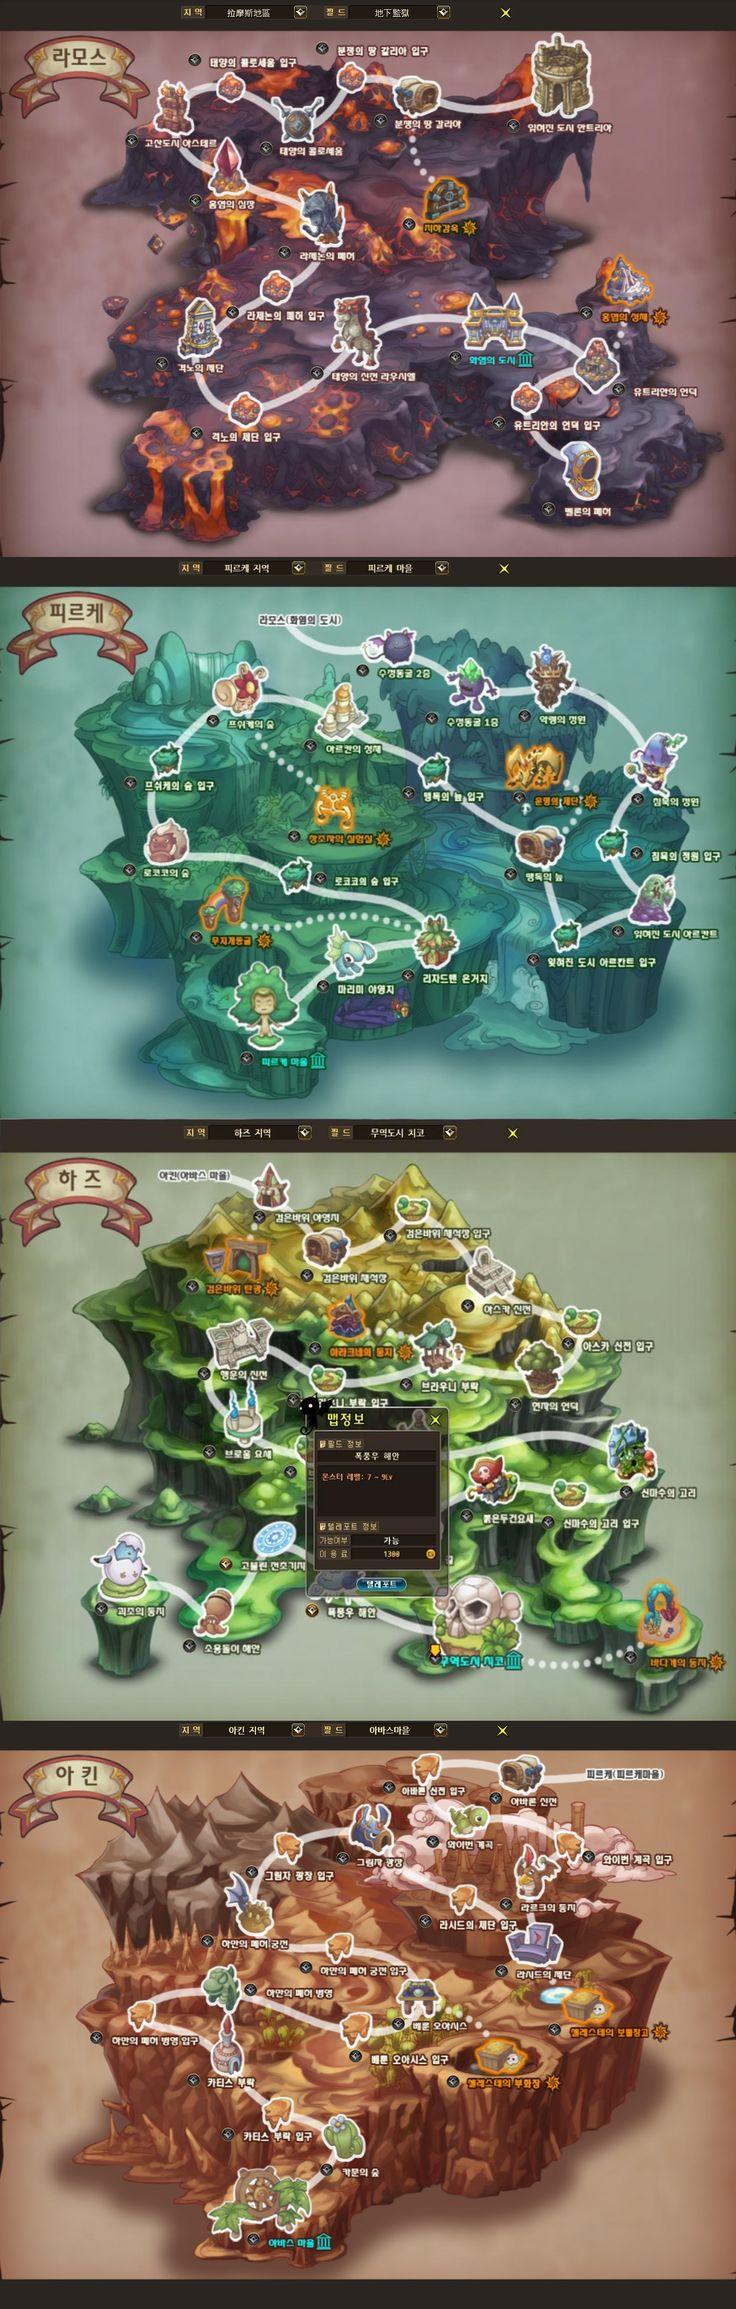 heva clonia world map